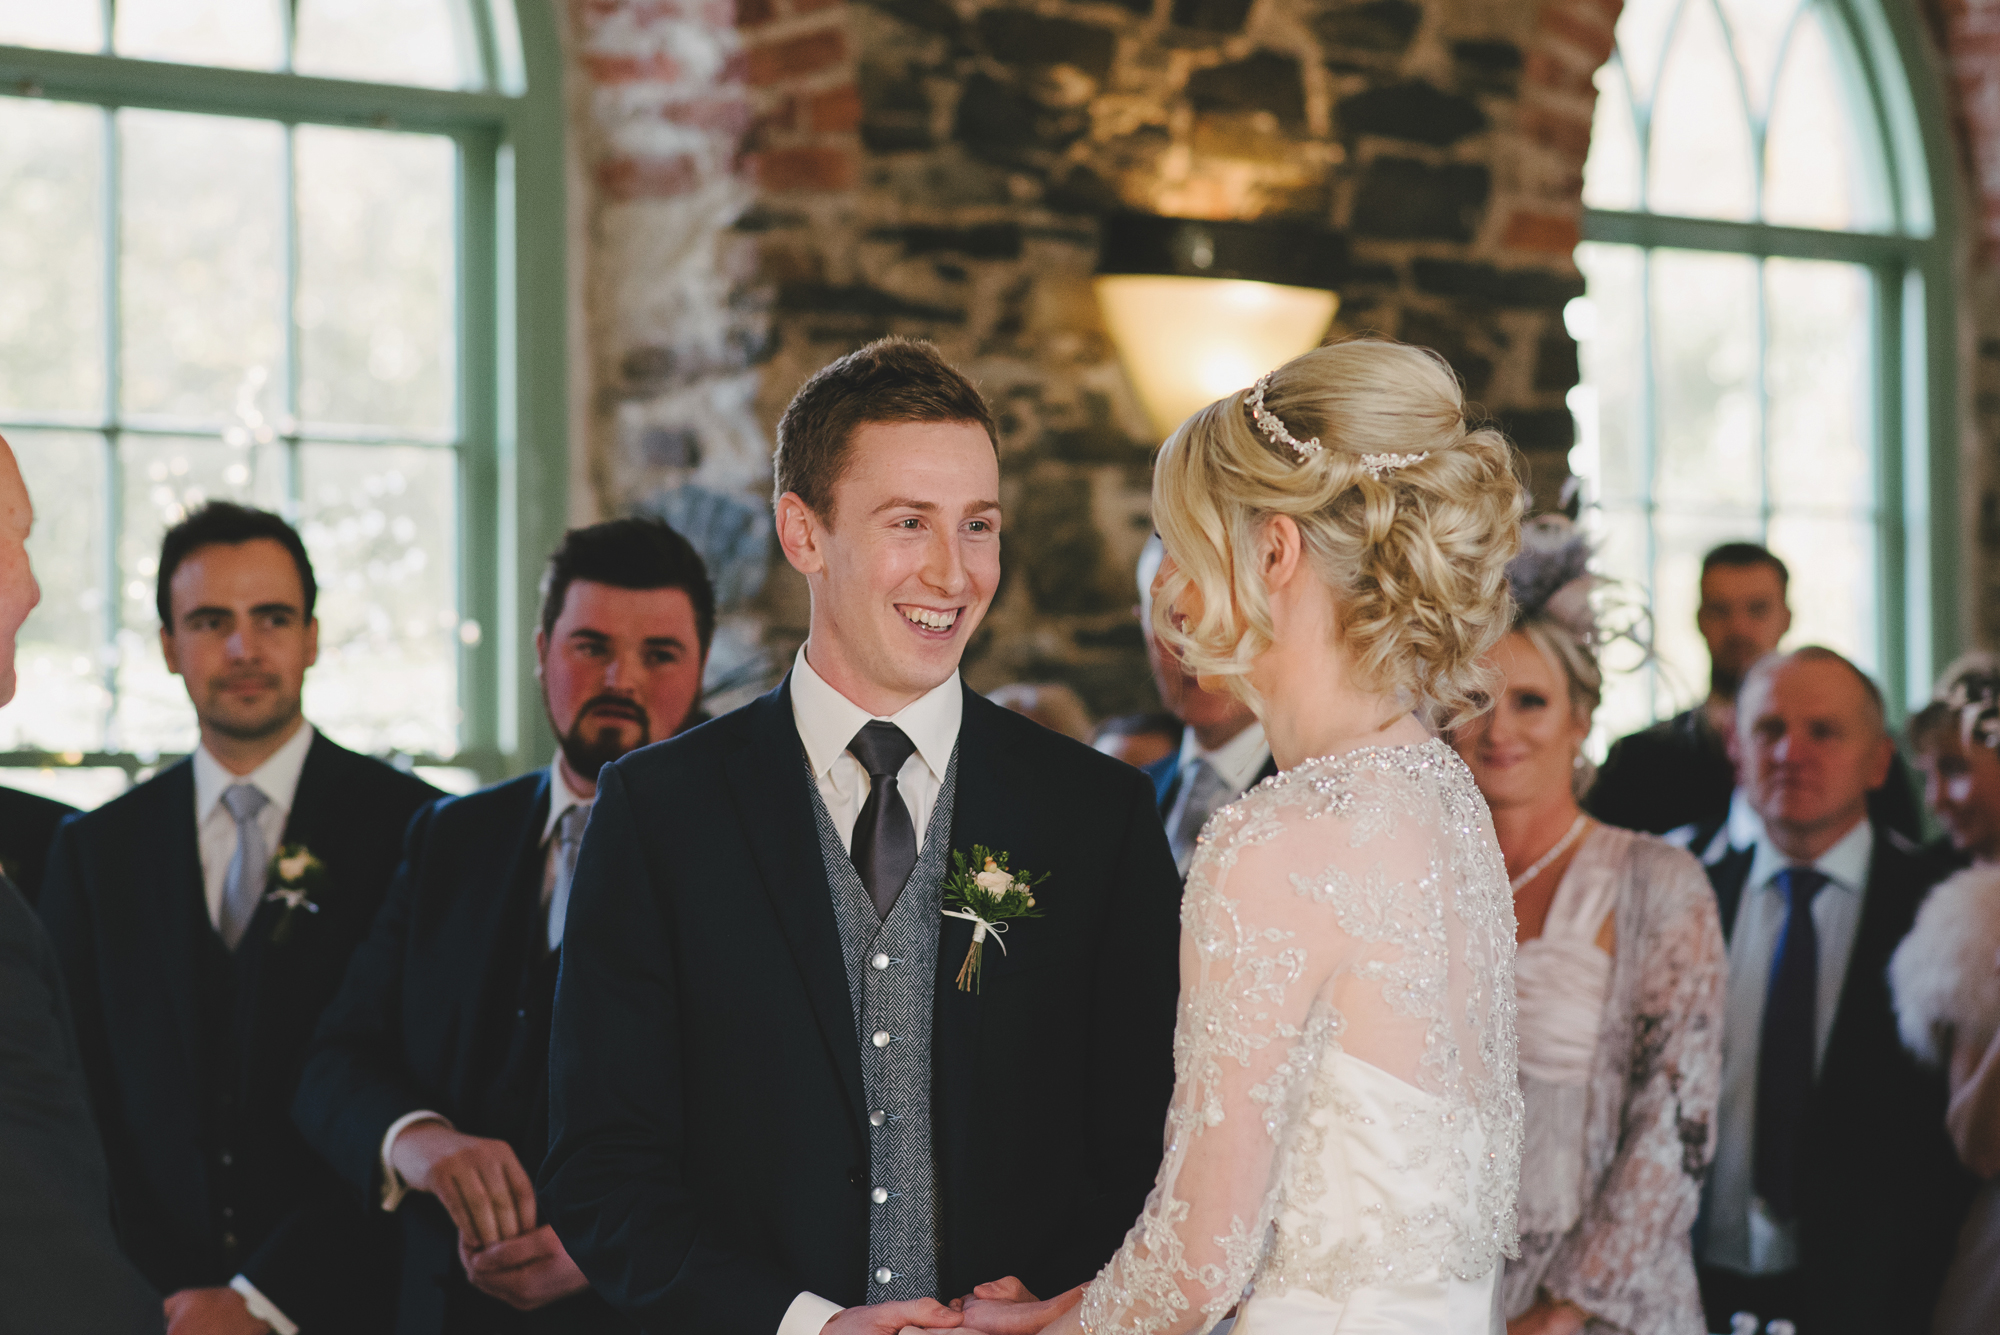 wedding_orange_tree_house_northern_ireland_12.jpg